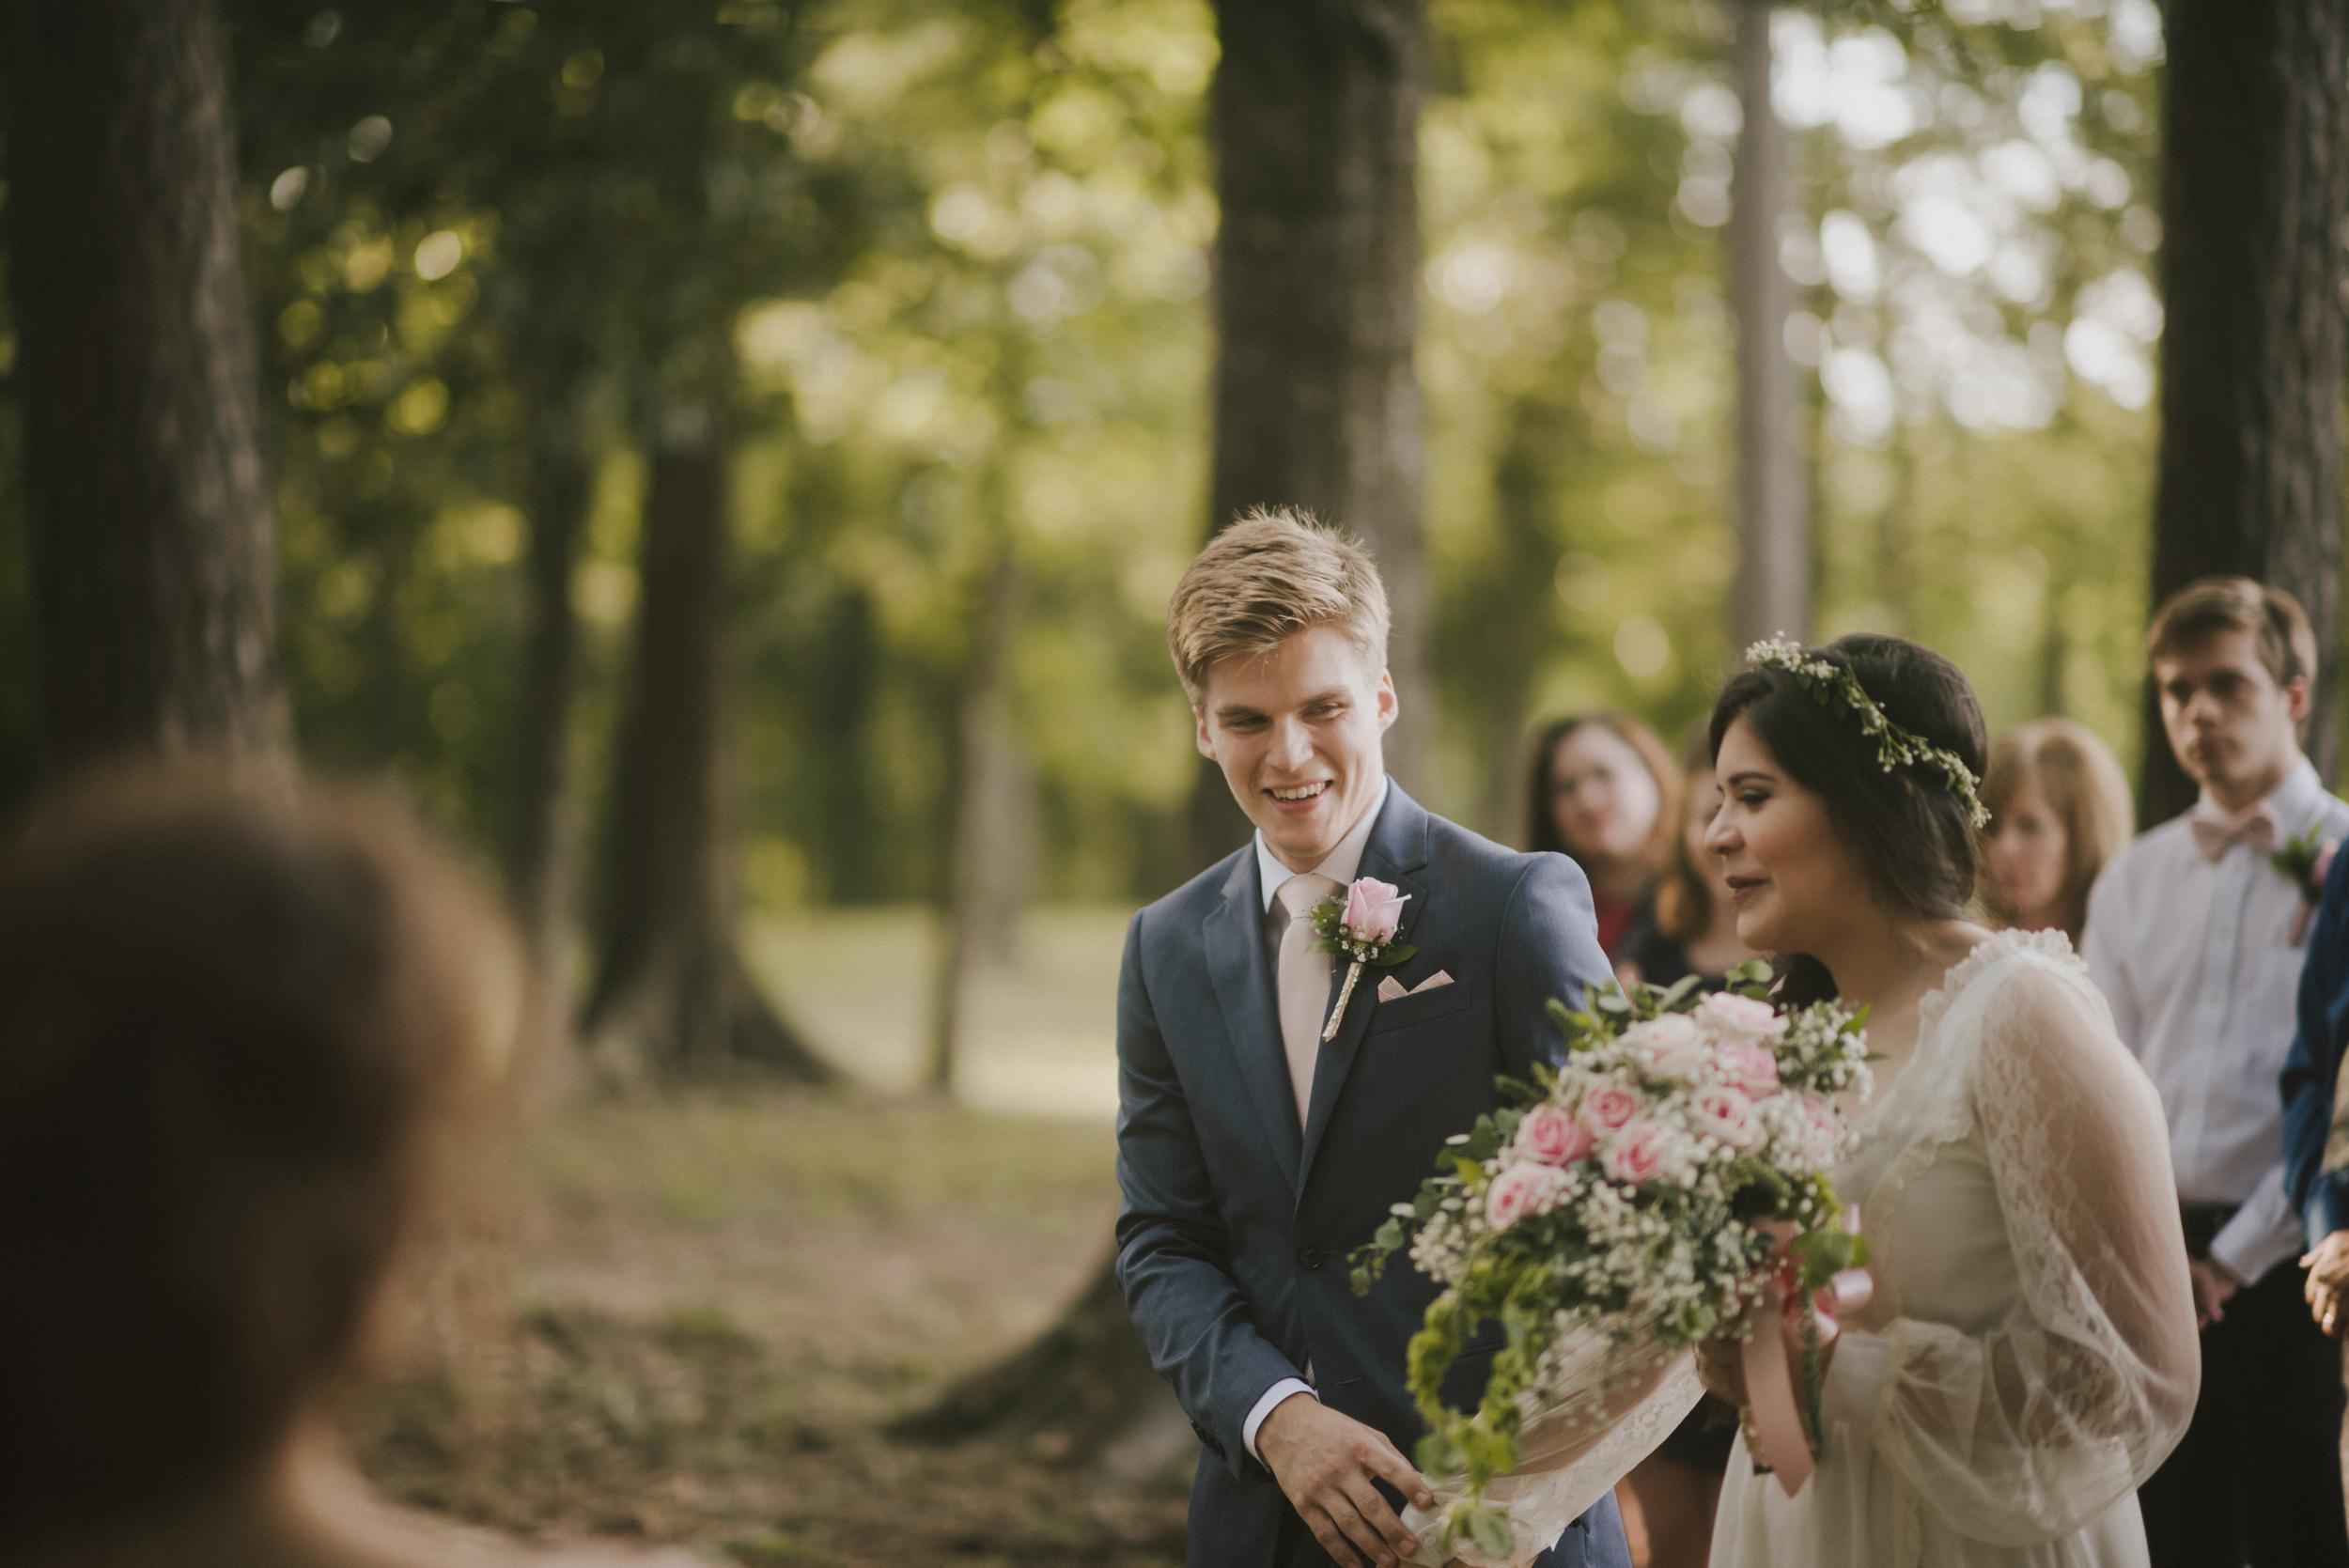 ofRen_weddingphotographer-128.jpg